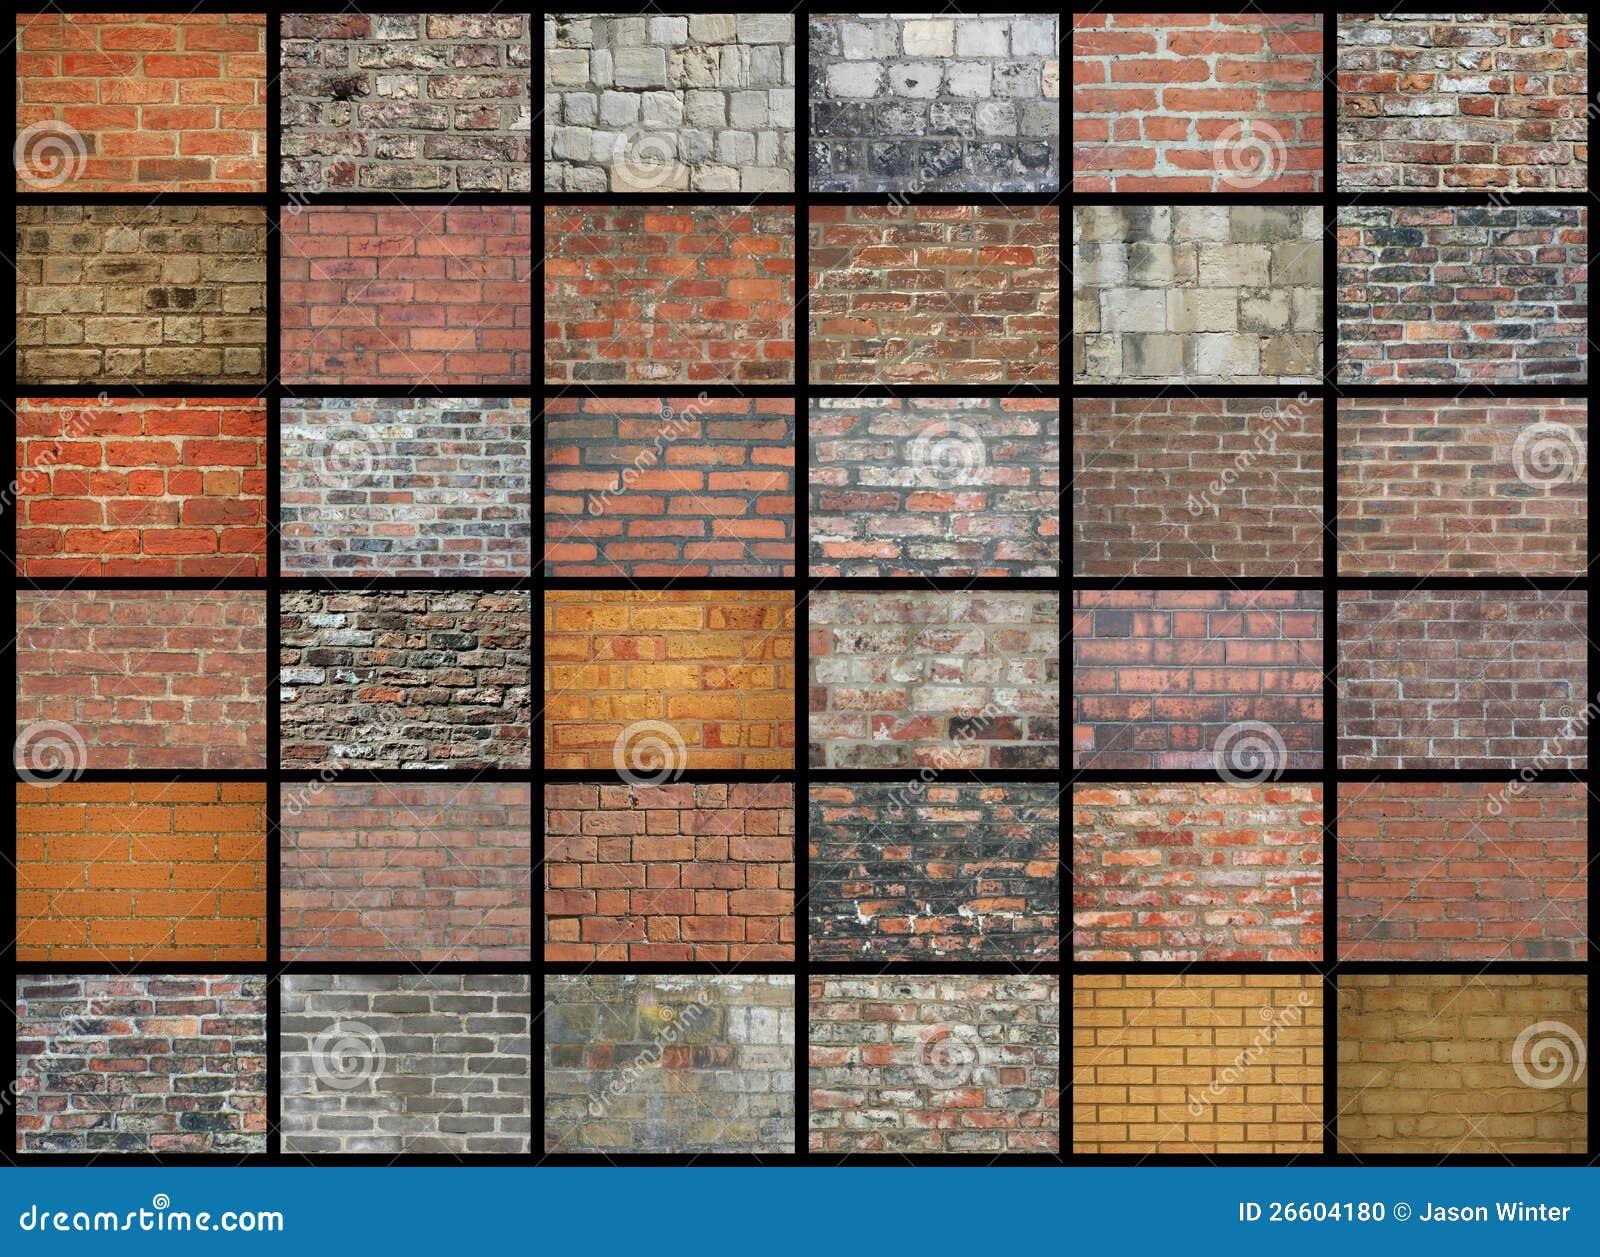 Paredes de ladrillo foto de archivo imagen 26604180 - Paredes de pladur o ladrillo ...